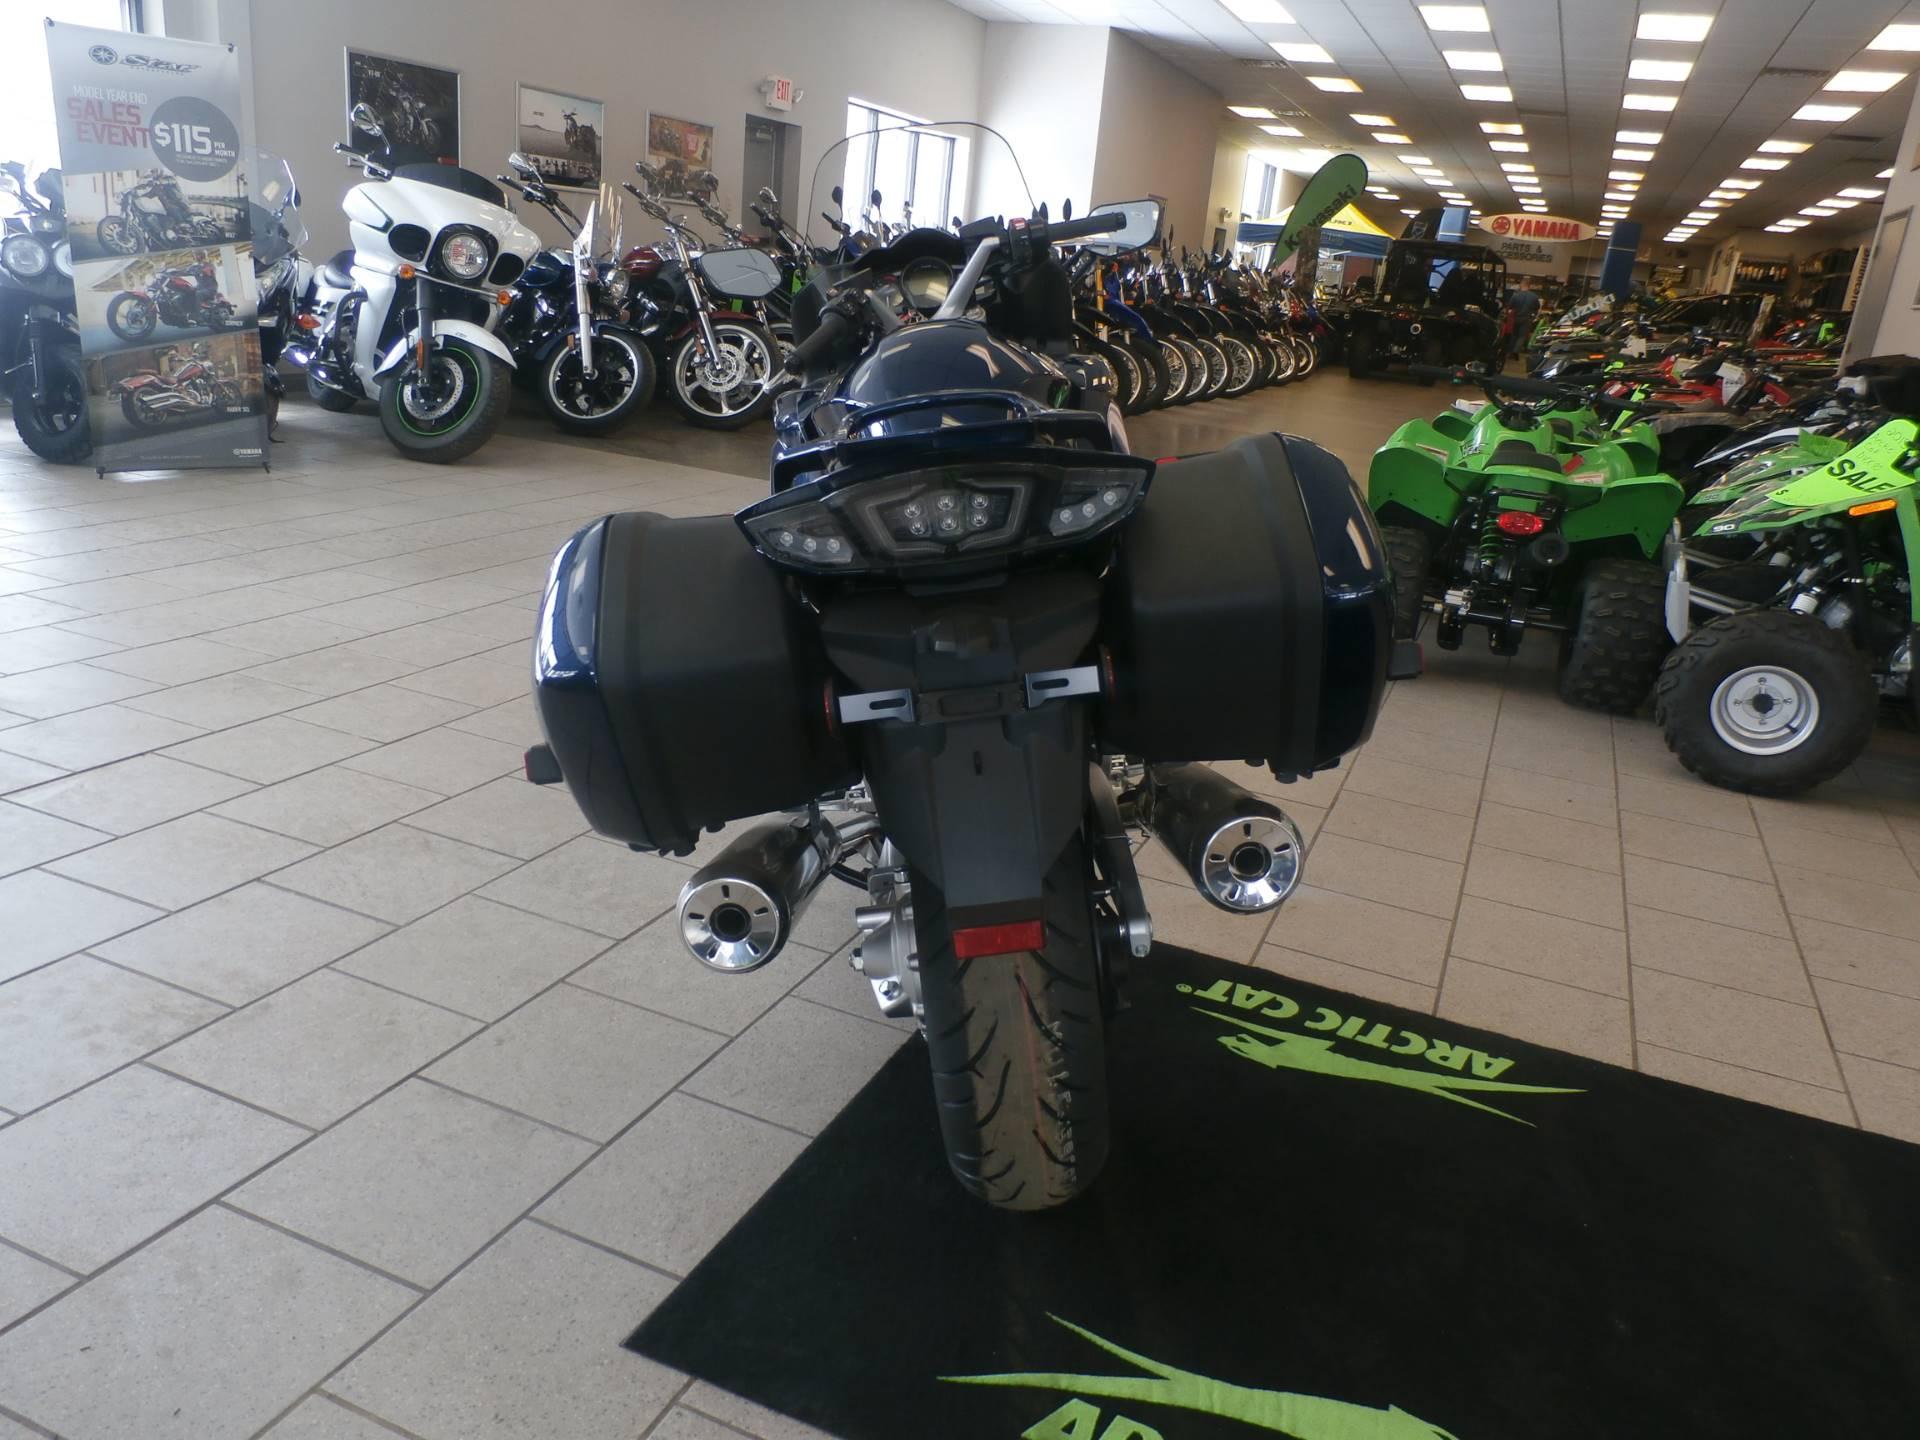 2016 Yamaha FJR1300A 4